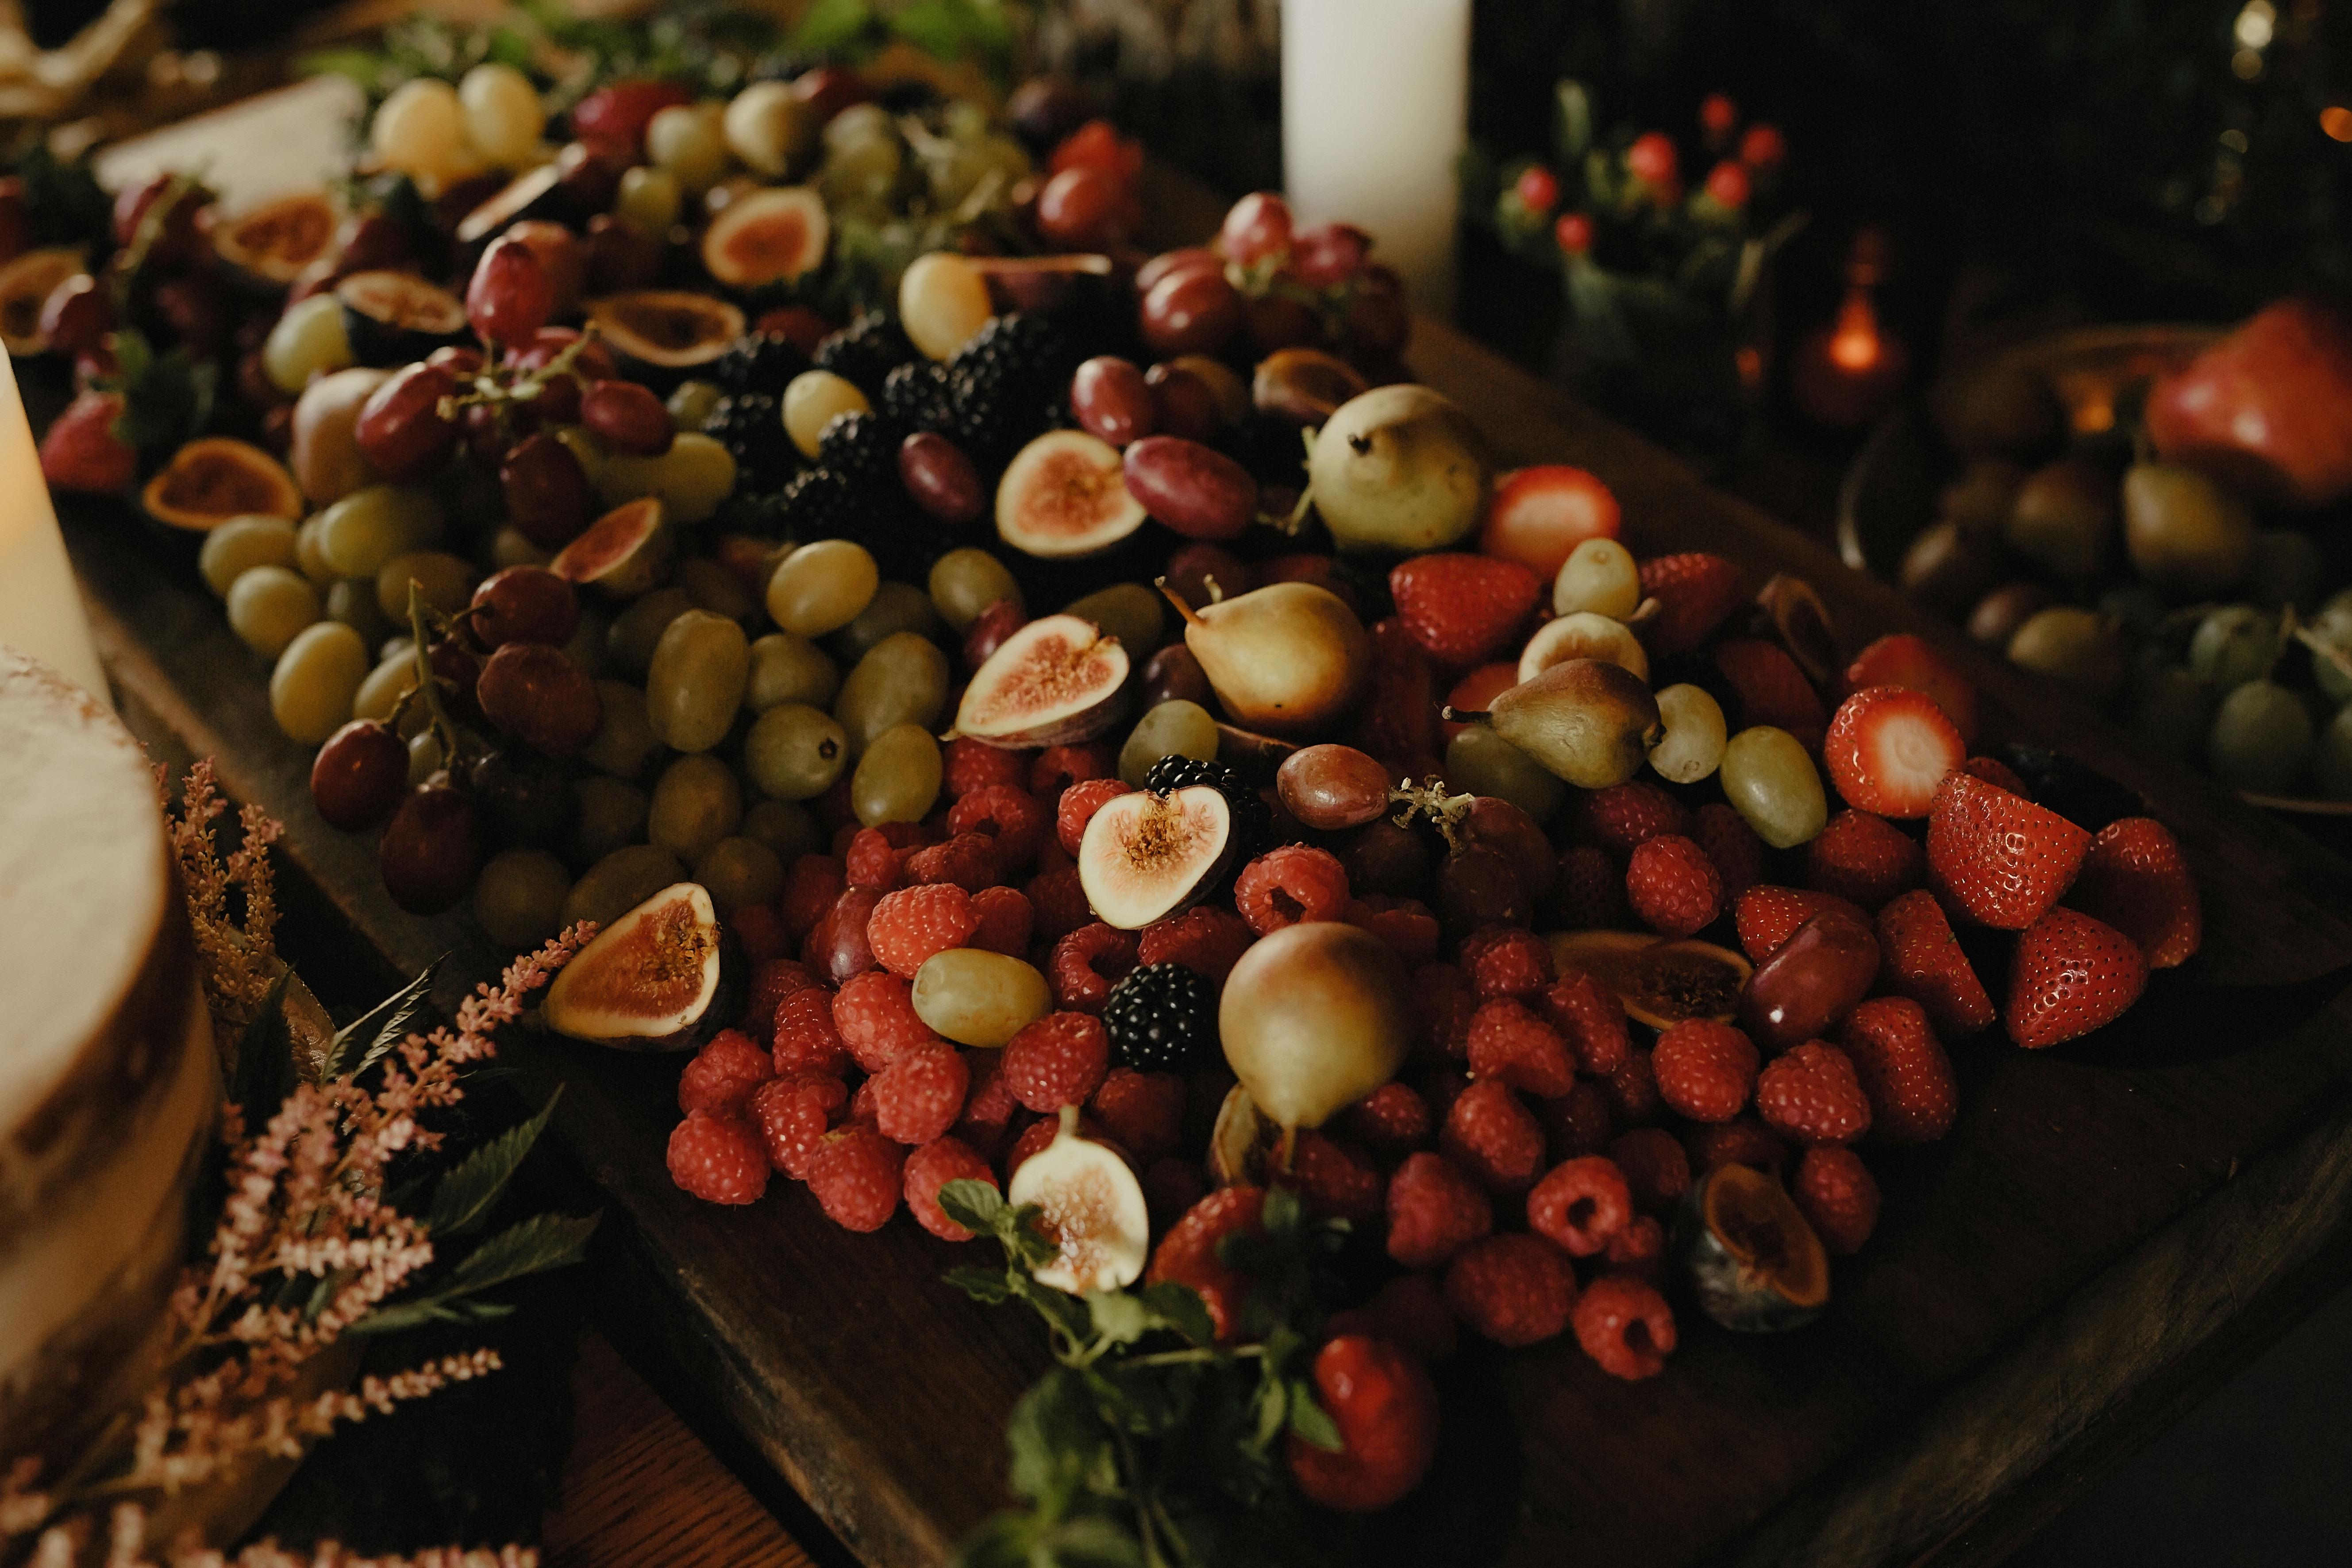 Categories: Weddings-Real Wedding: Robin & Joe - Photography by Danelle Bohane